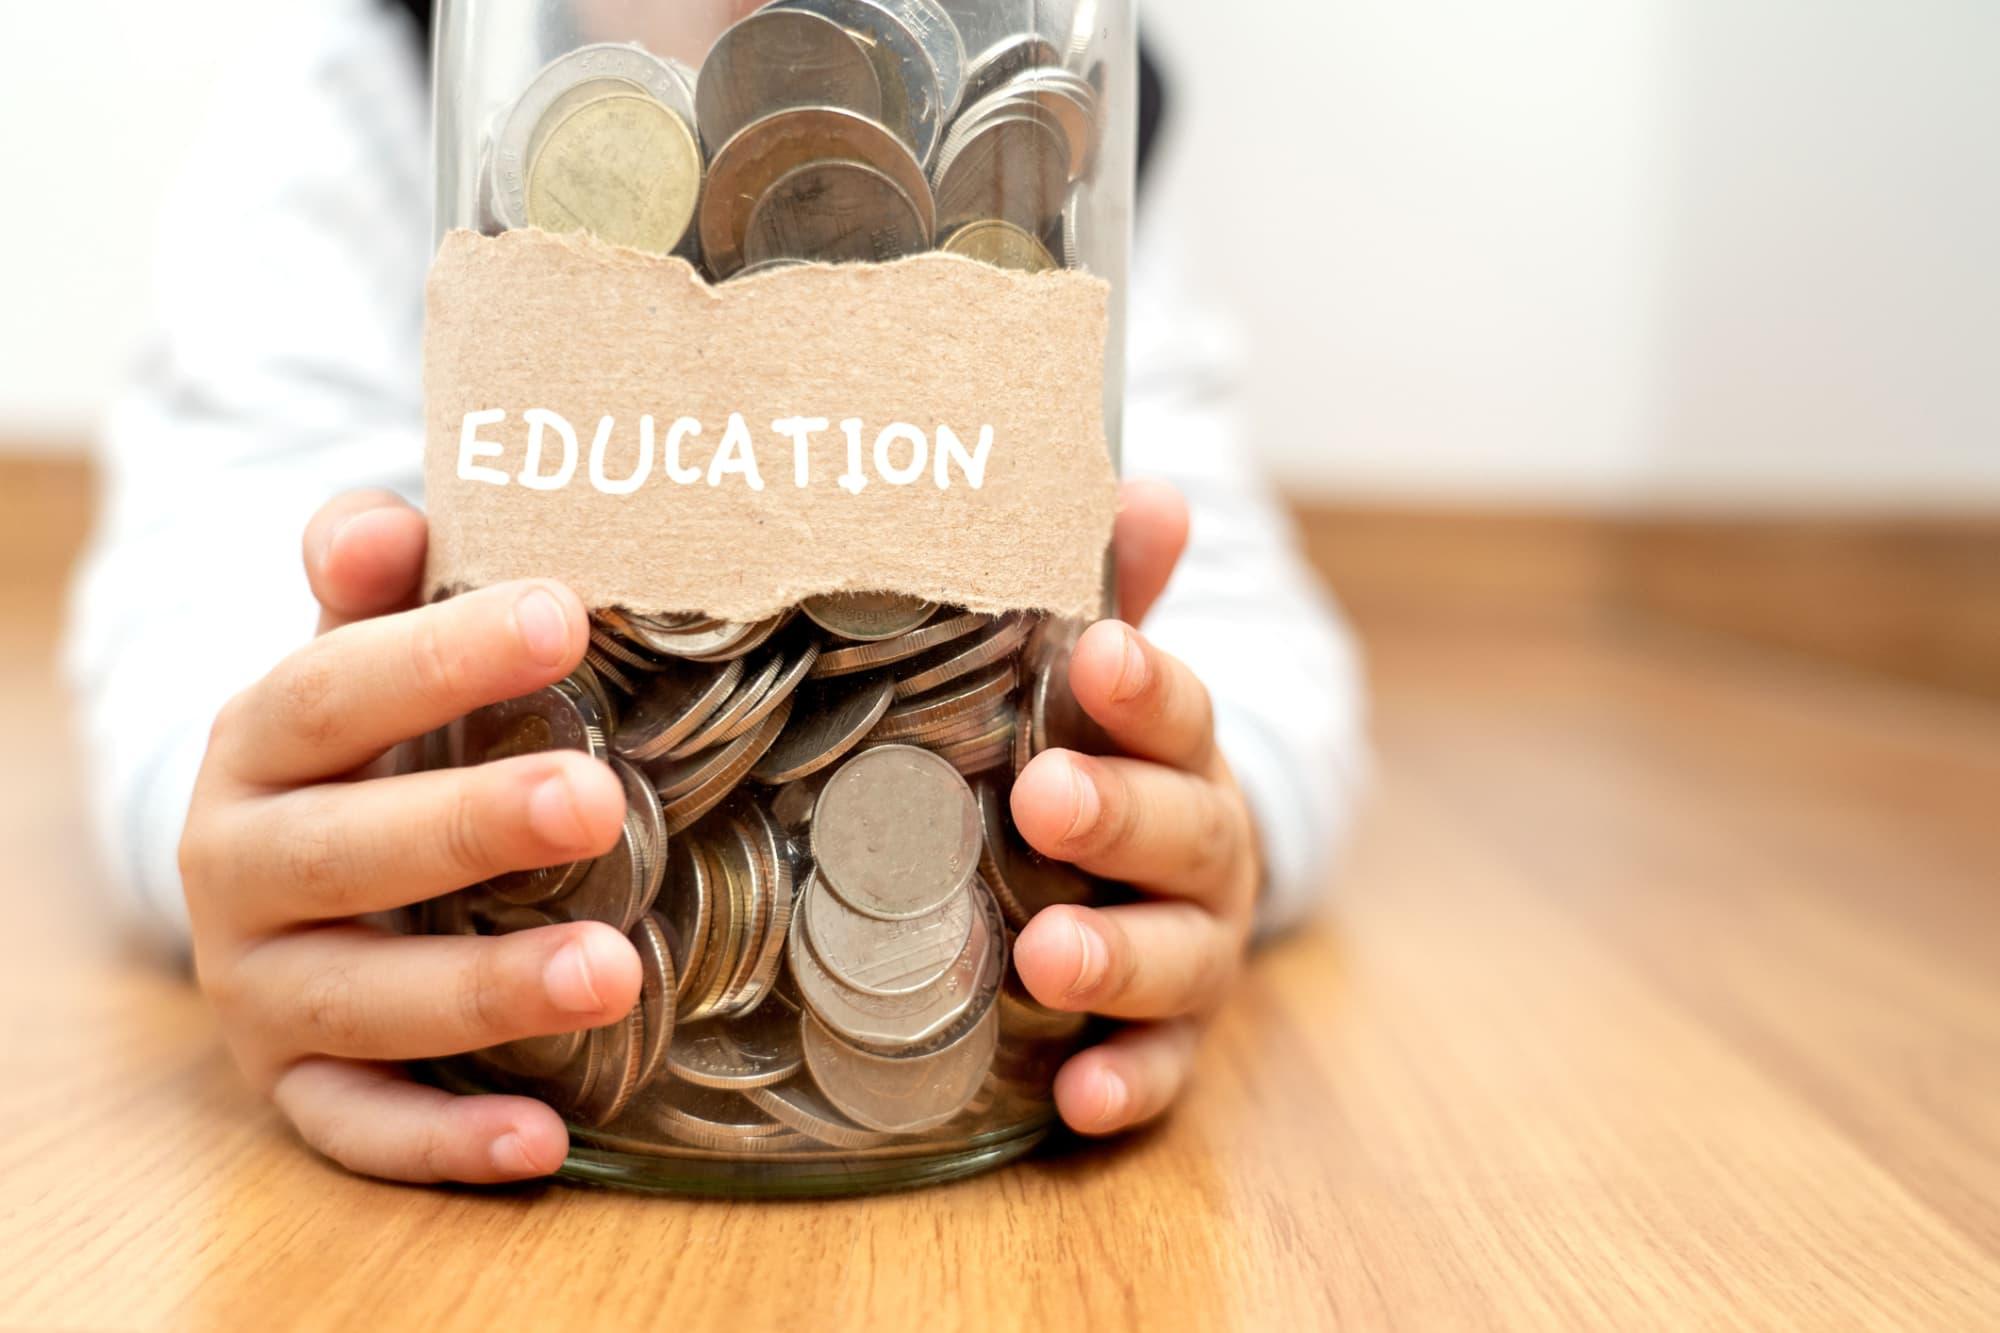 Vocational Education Financial Aid tumbnail